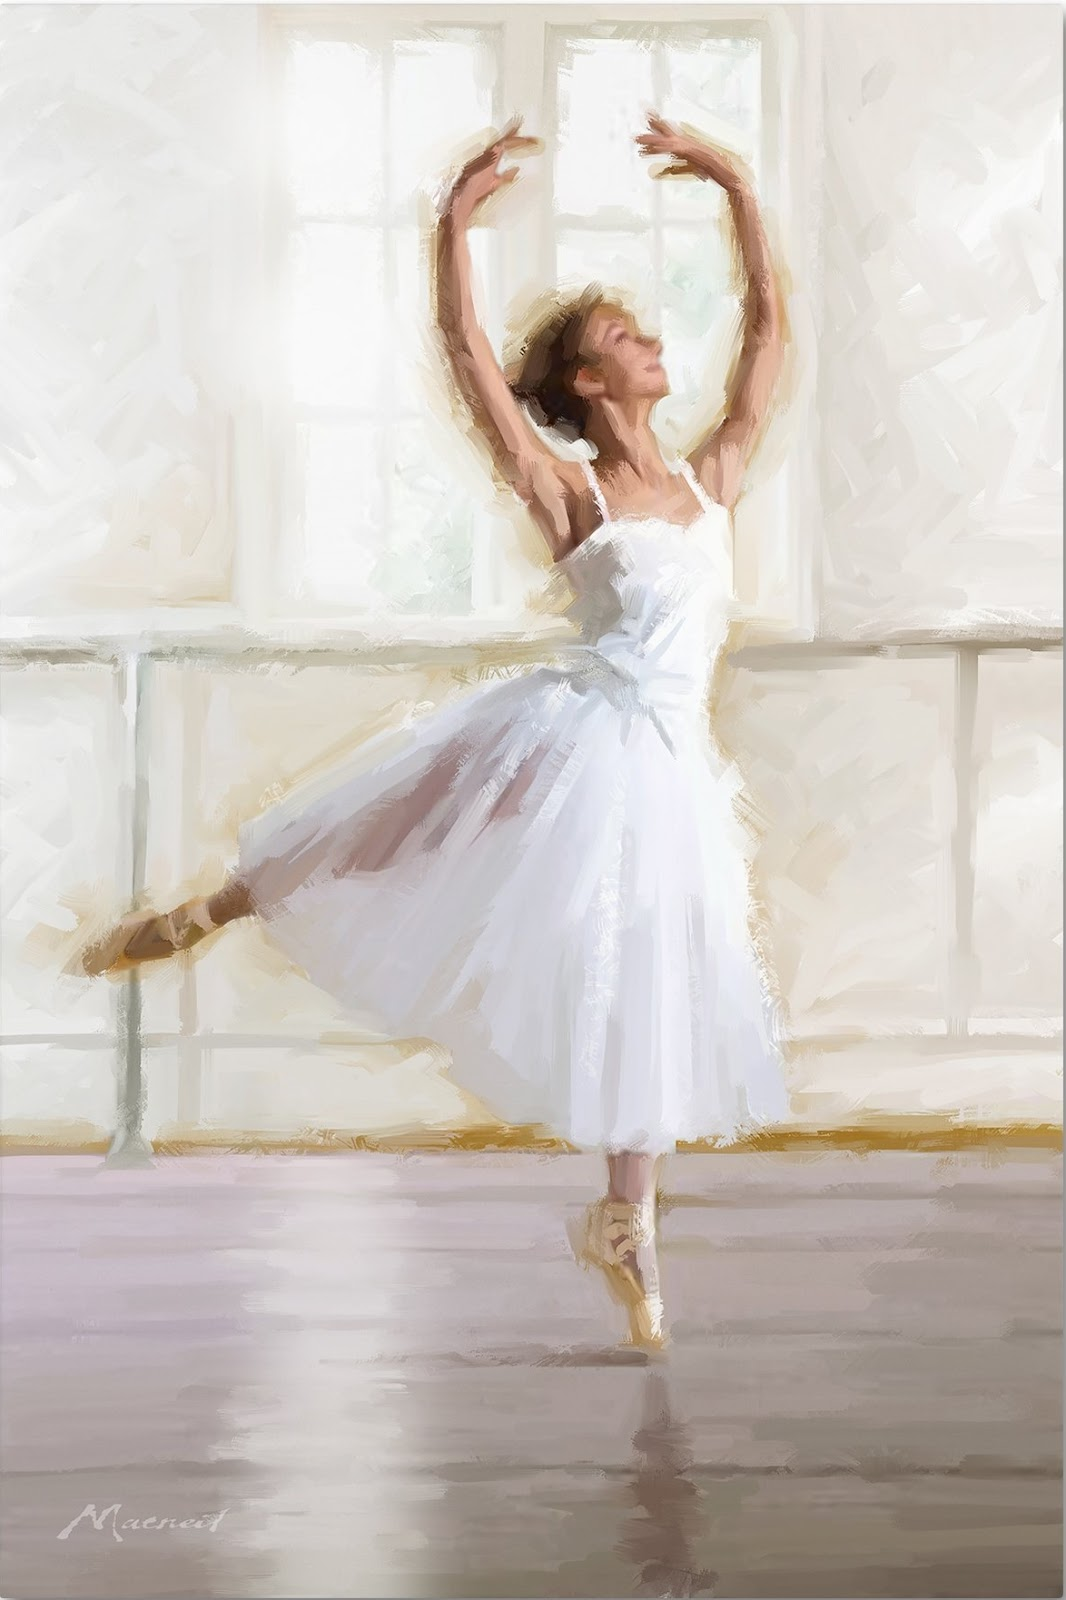 Richard Macneil  allet Dancer